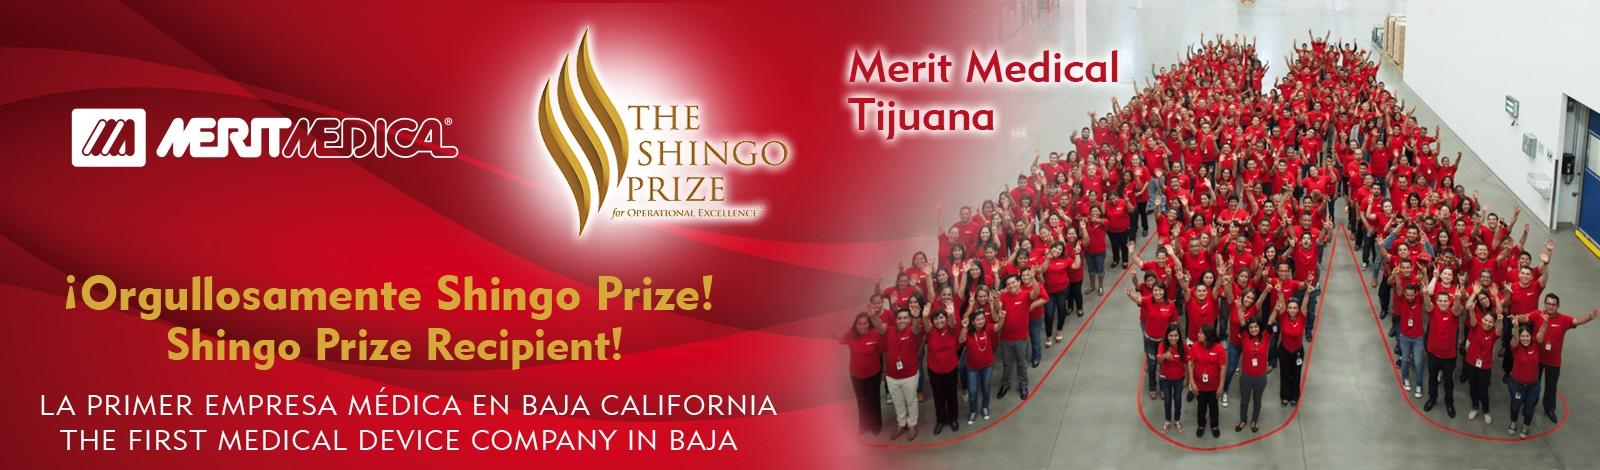 Shingo_Prize